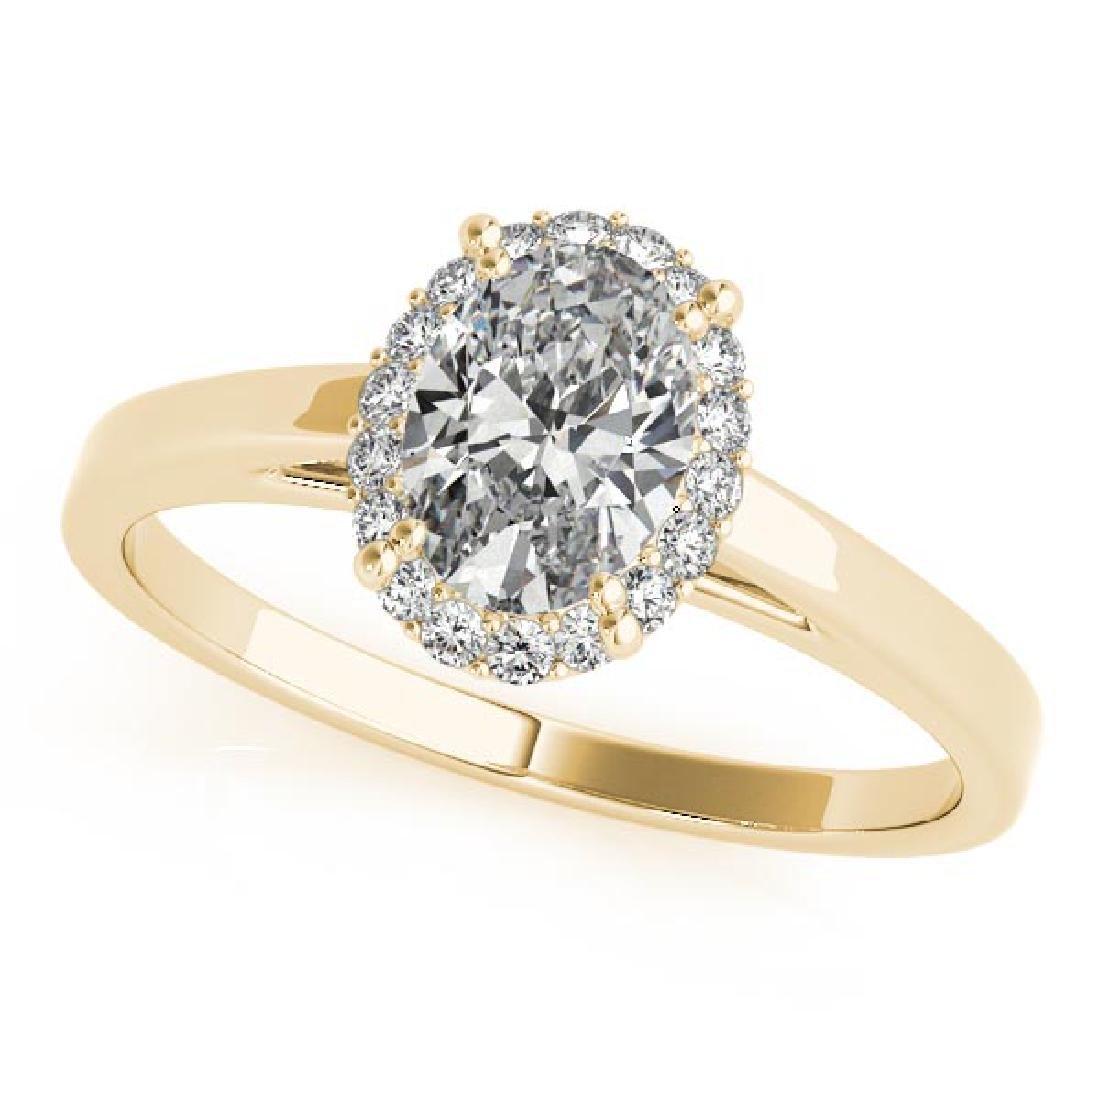 CERTIFIED 14KT WHITE GOLD .95 CT G-H/VS-SI1 DIAMOND HAL